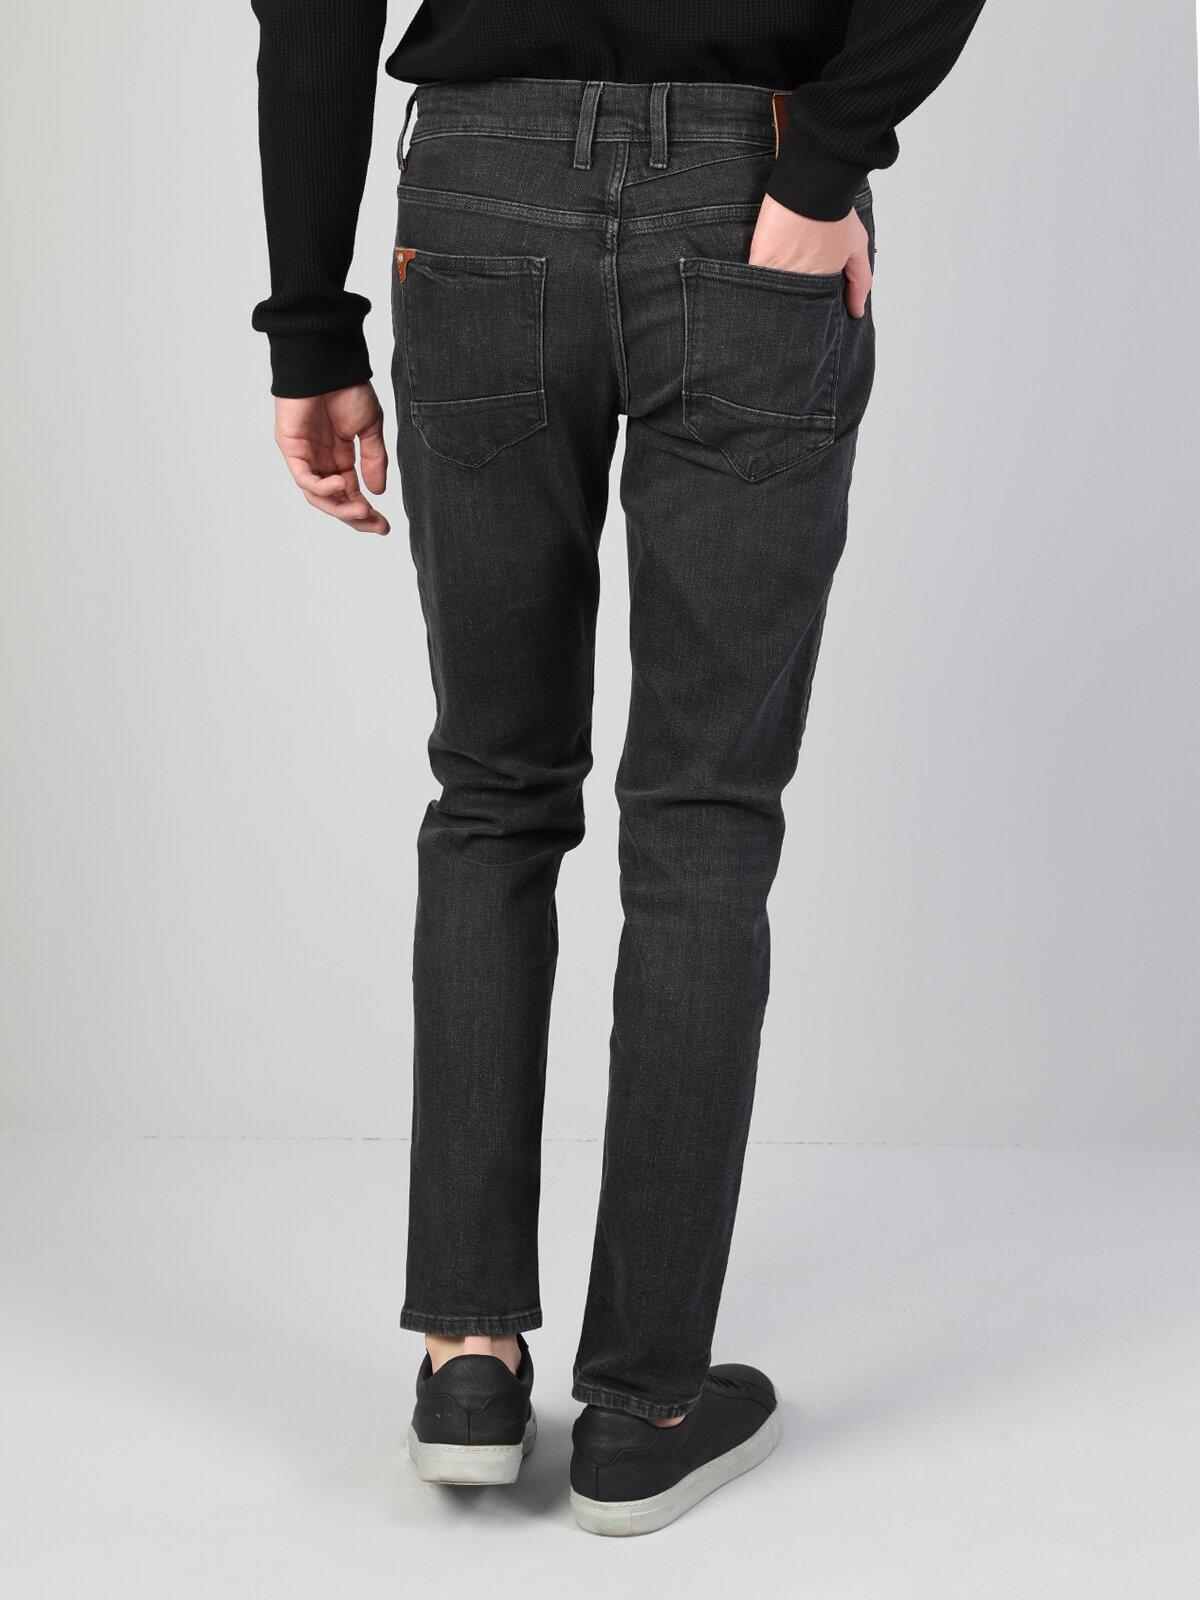 041 Danny Dar Kesim Koyu Mavi Erkek Denim Pantolon